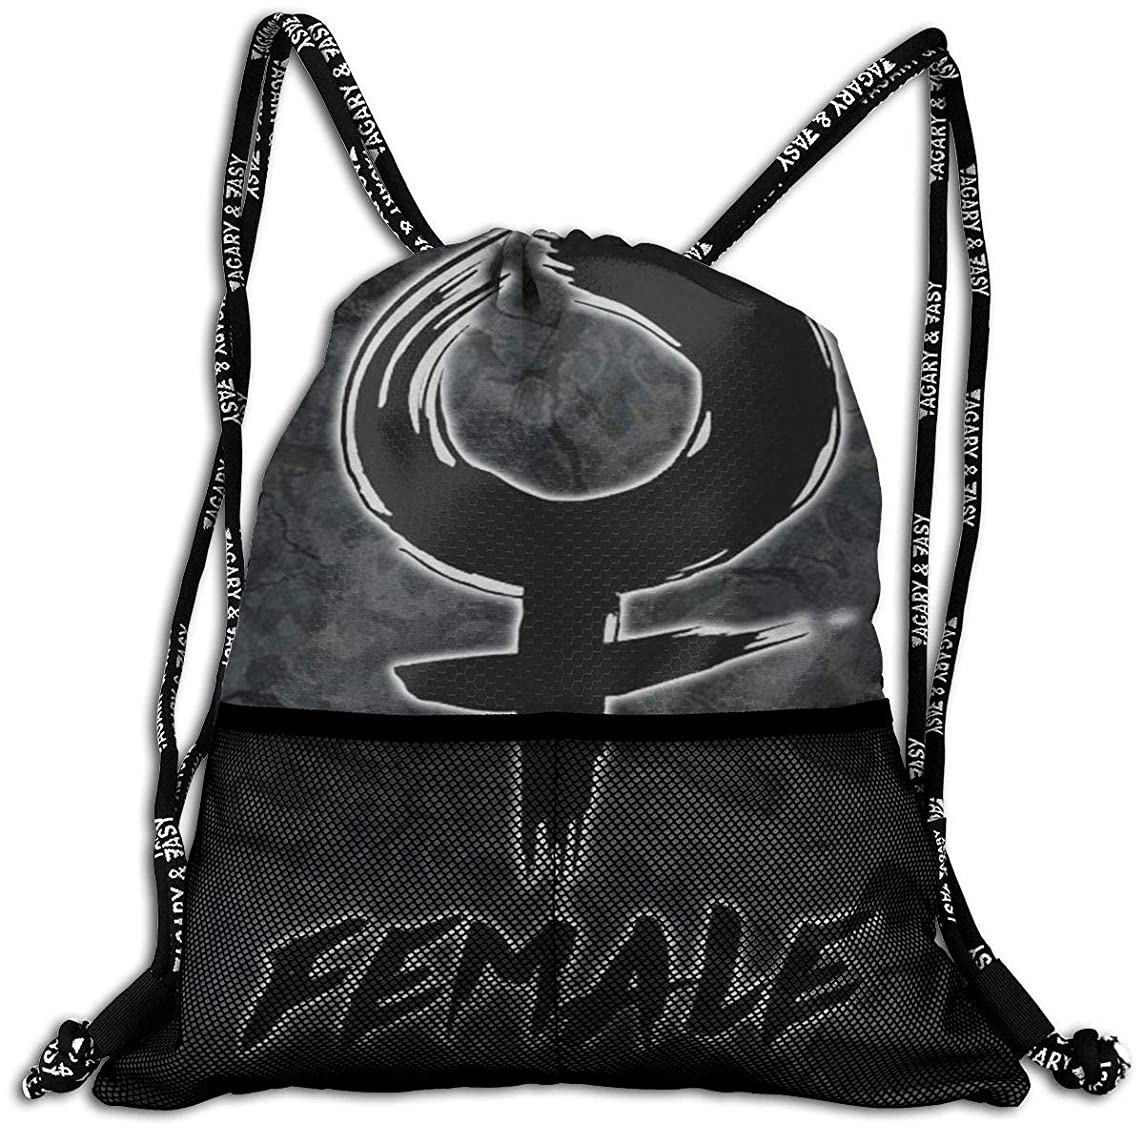 JOHNATHANGRIFFIN Keith Urban Drawstring Backpack Bag Mens Womens Sport Gym Sack